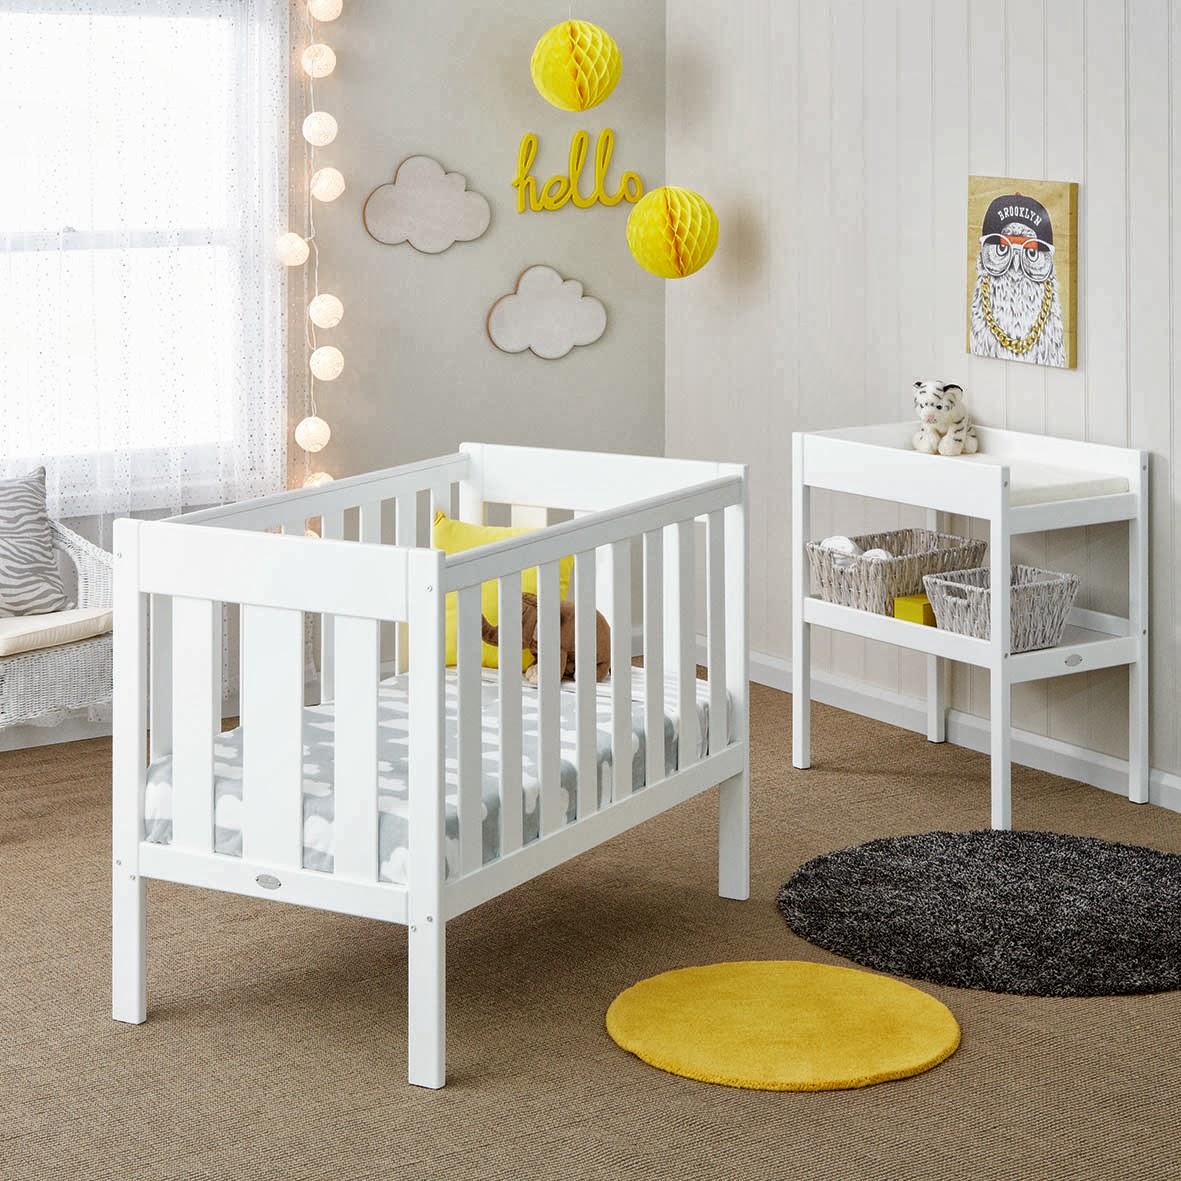 Nursery Chair Australia Navy Blue Velvet Club The Style Index Rock A Bye Baby Fantastic New